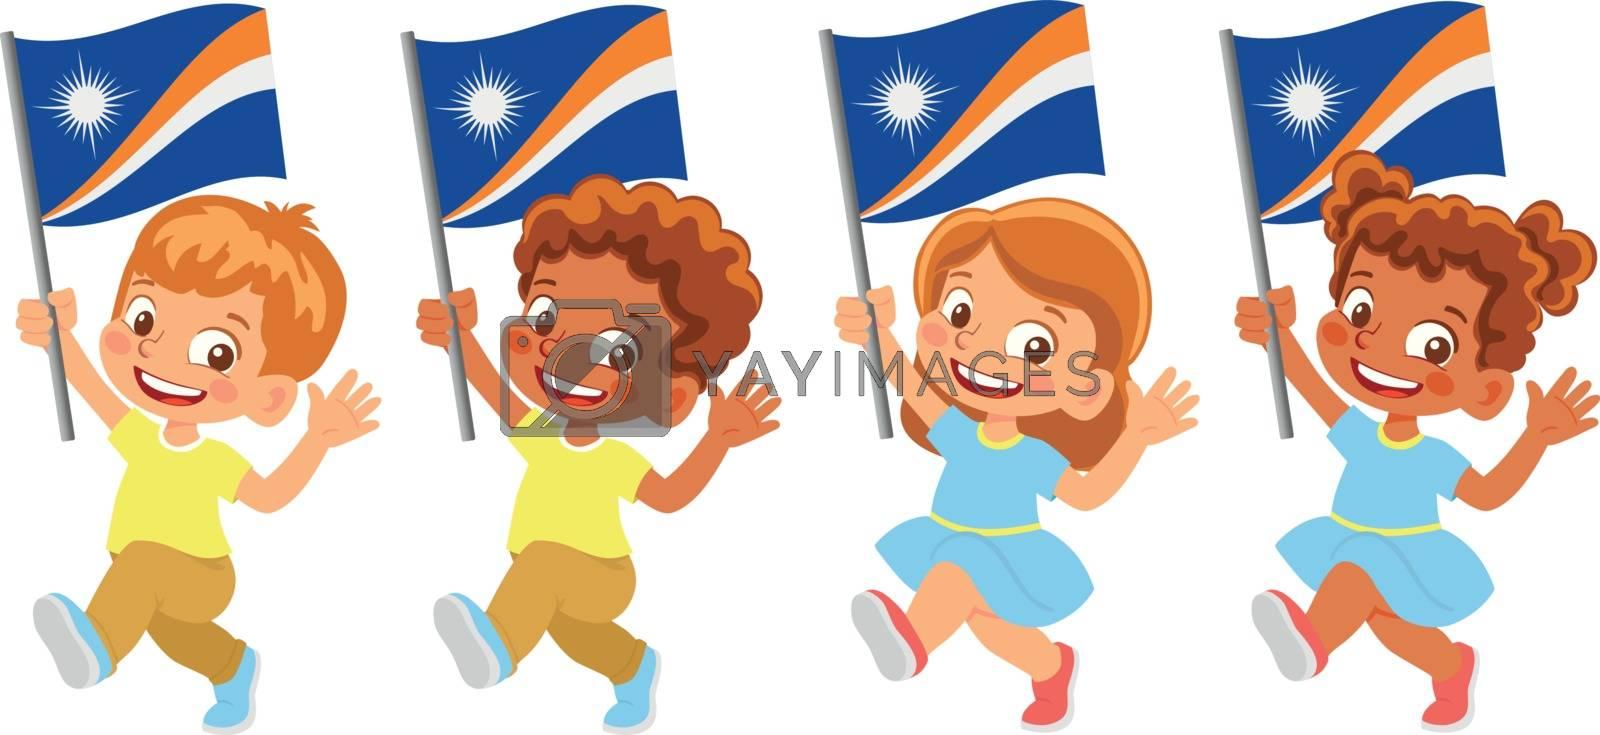 Marshall Islands flag in hand. Children holding flag. National flag of Marshall Islands vector